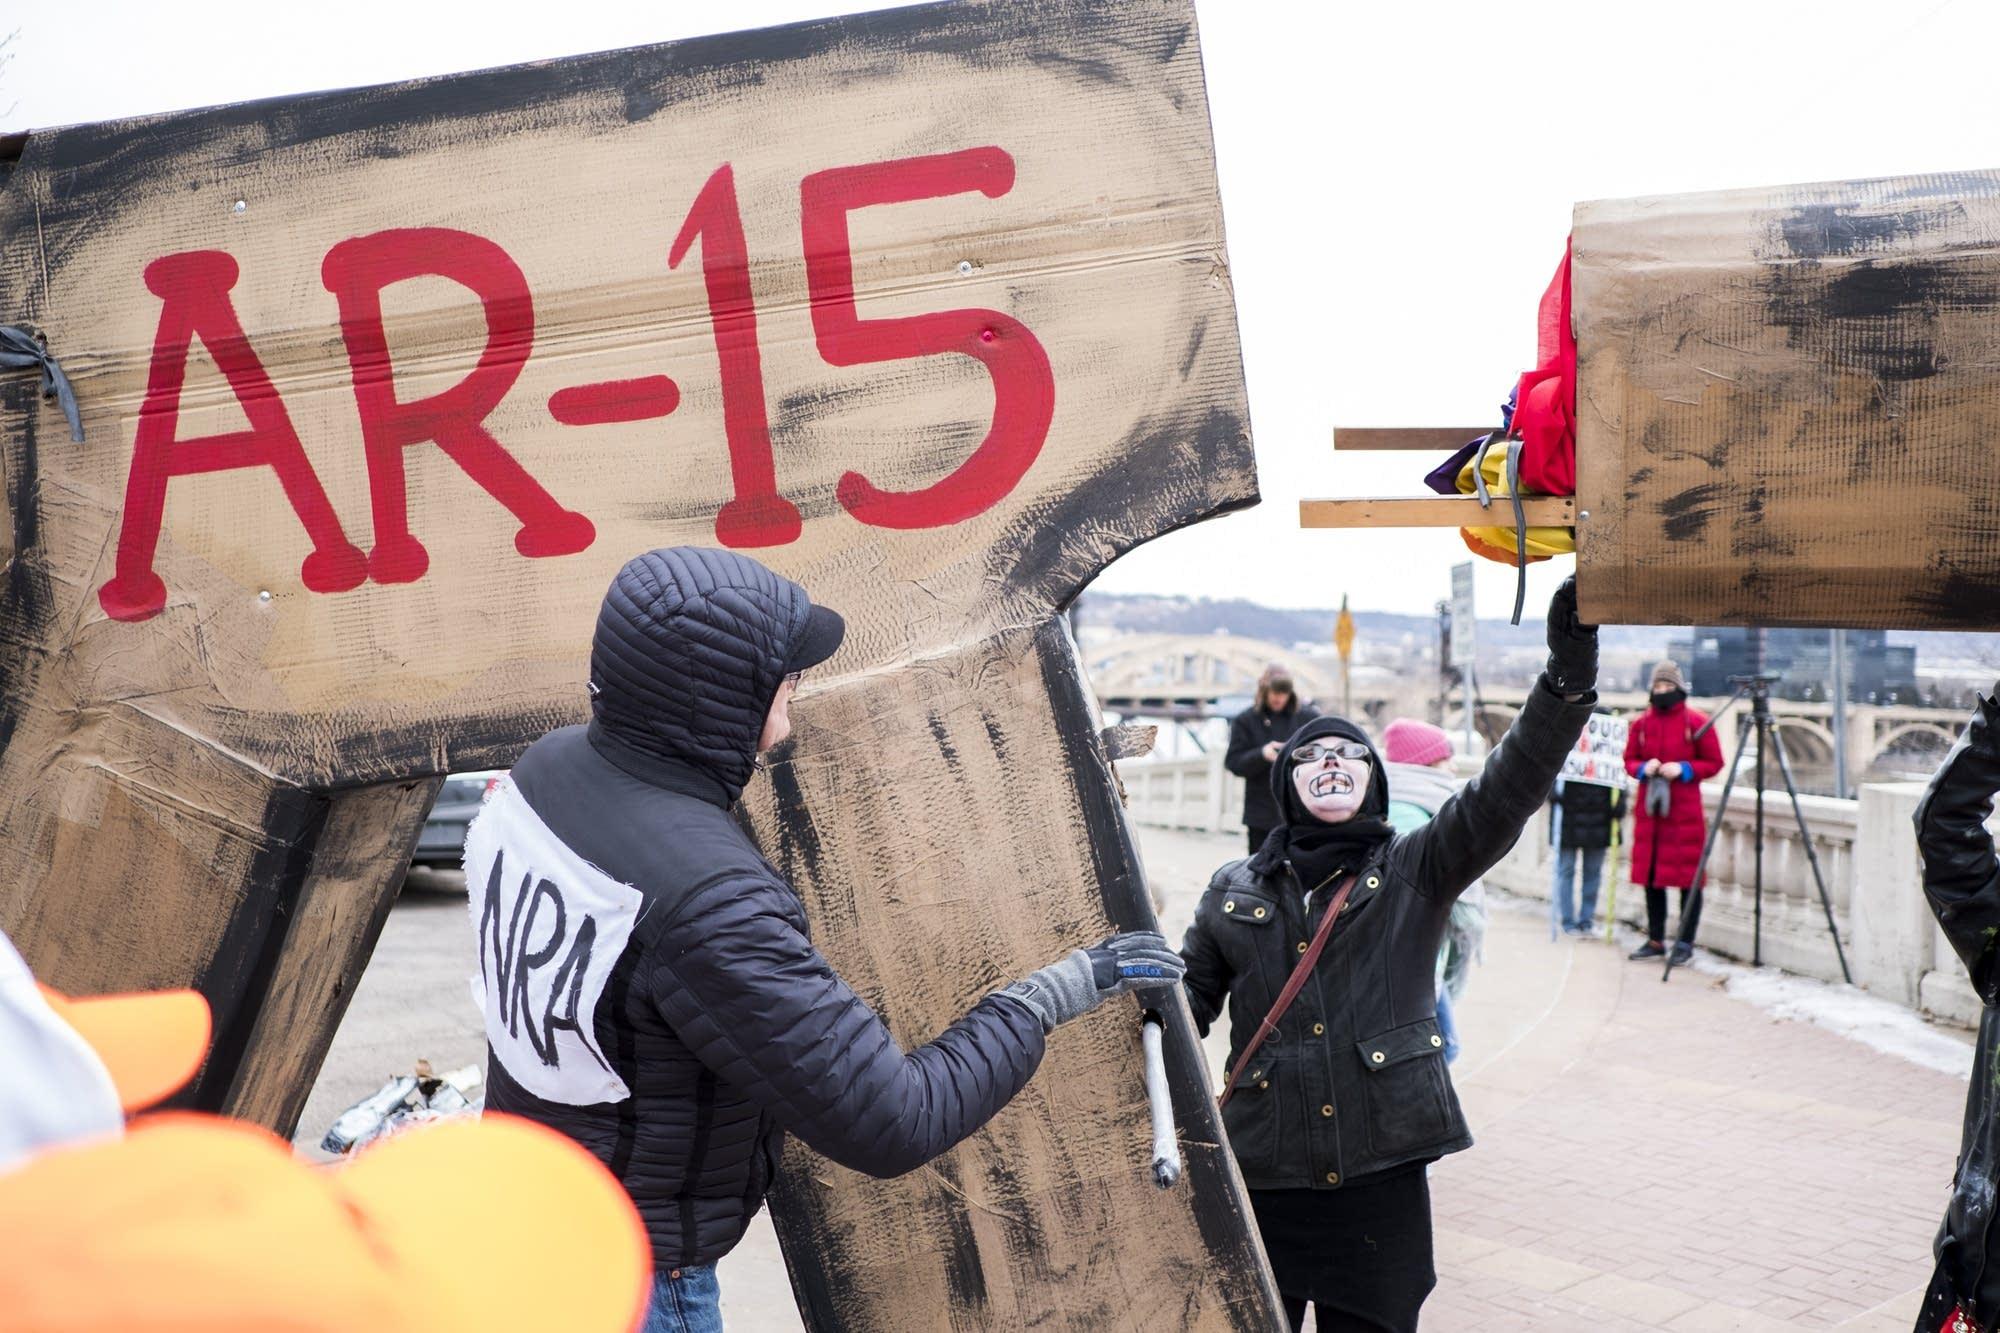 Member of Barebones Productions assemble a giant AR-15.